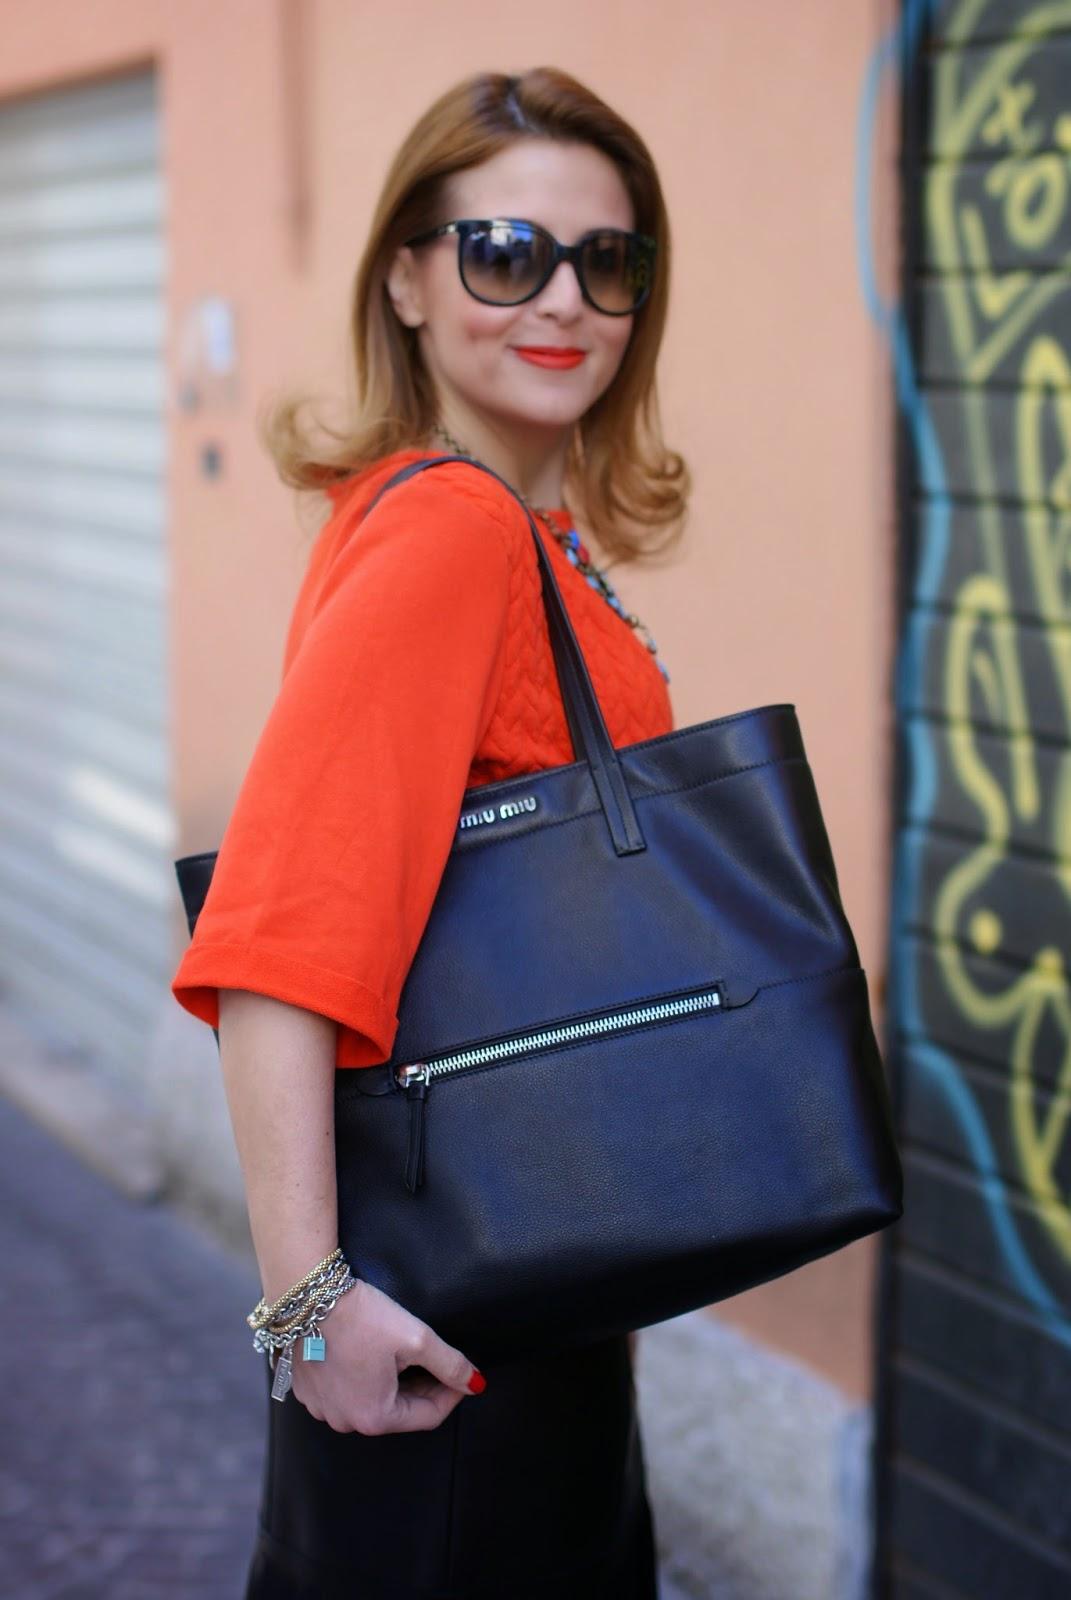 Blumarine leather fringed skirt, fringe hemline skirt, Miu Miu black tote, Fashion and Cookies fashion blog, fashion blogger